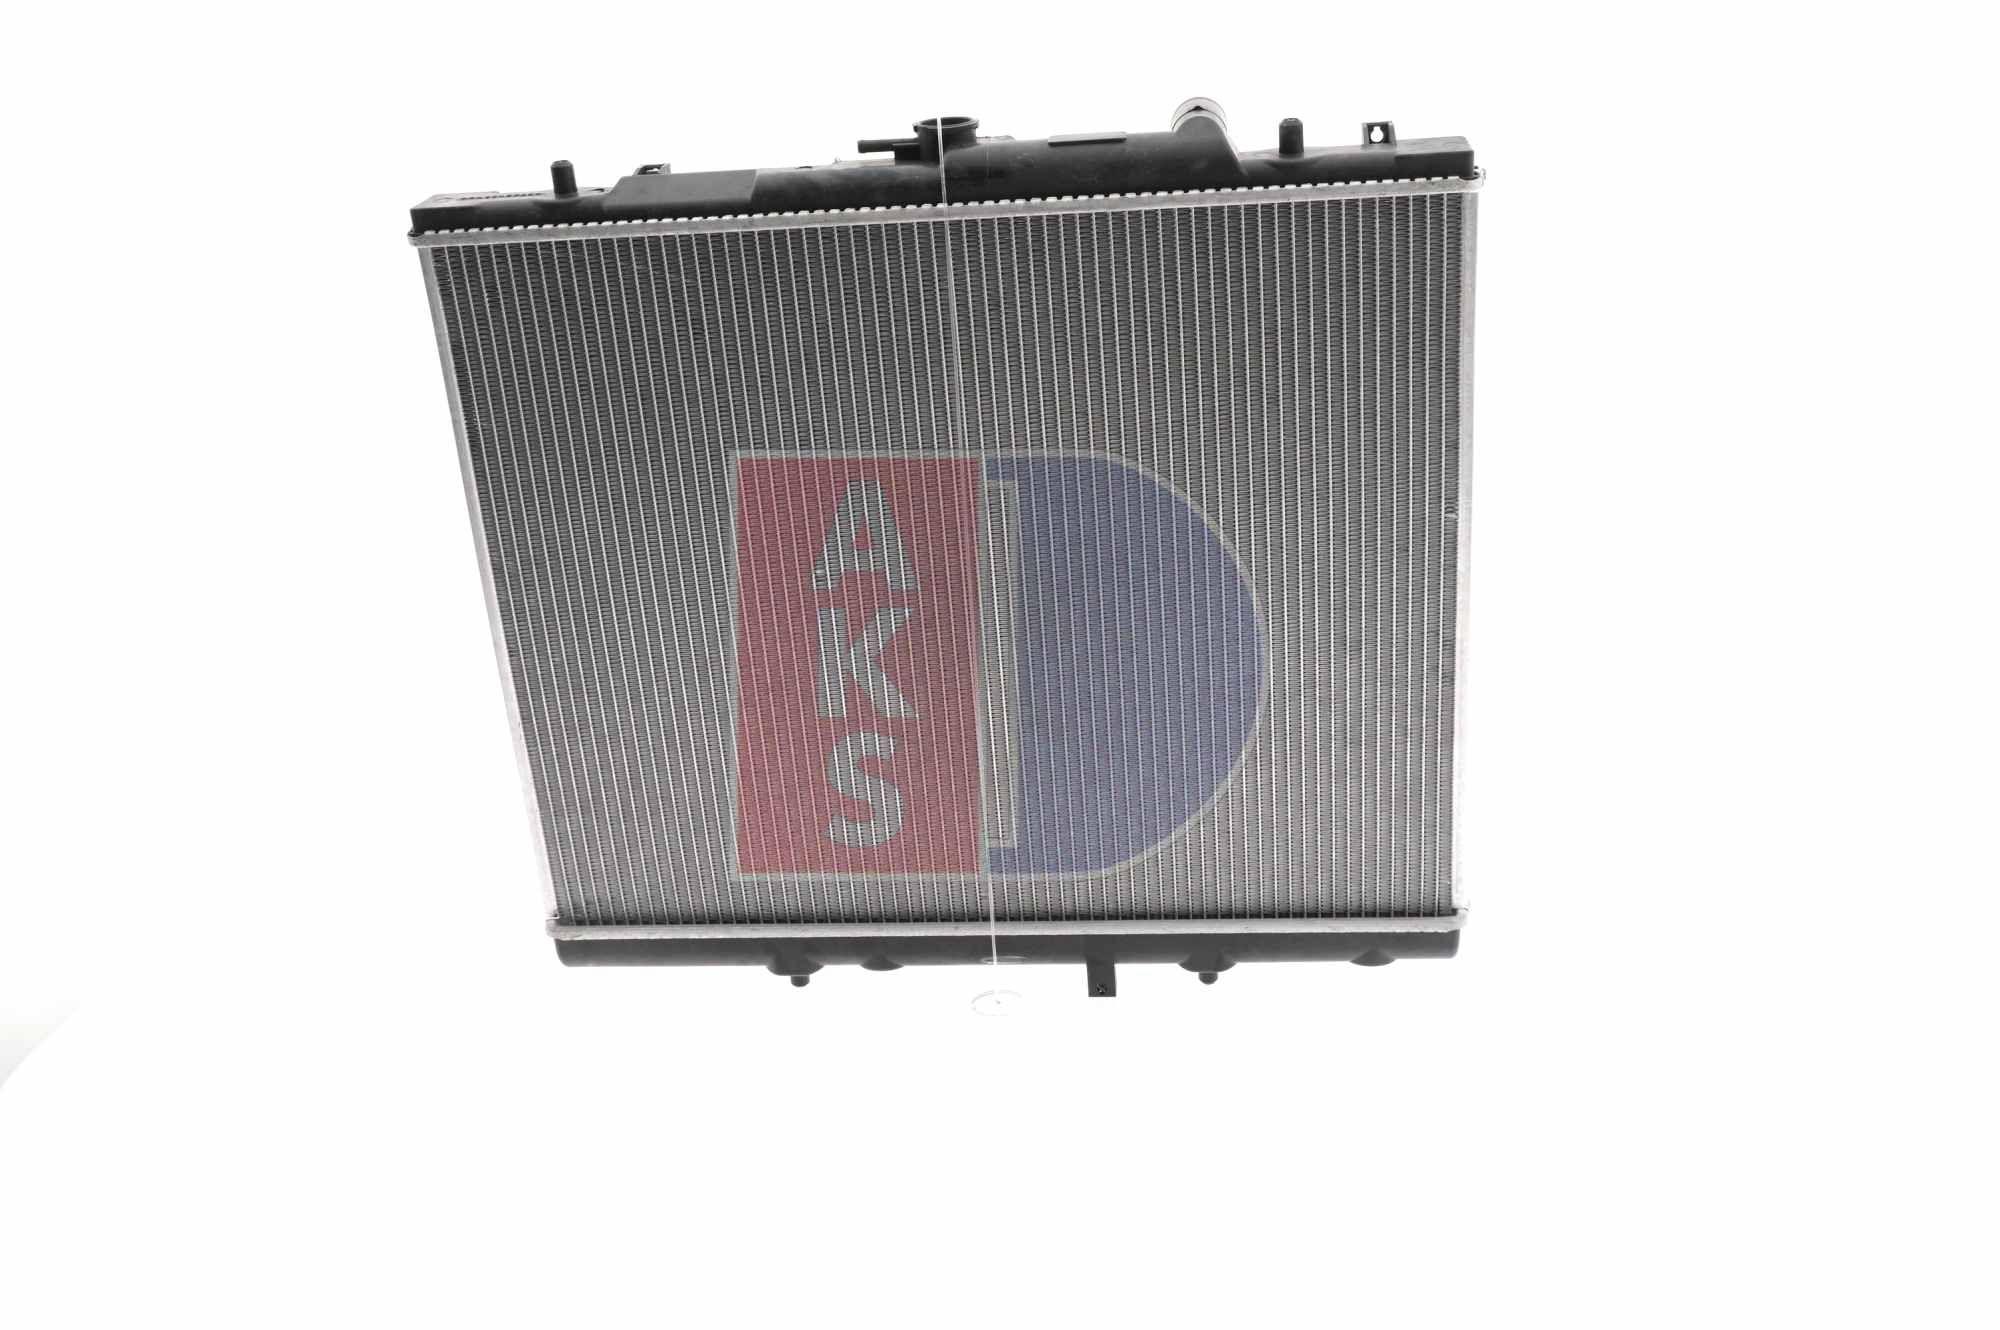 140017N Wasserkühler AKS DASIS 140017N - Große Auswahl - stark reduziert